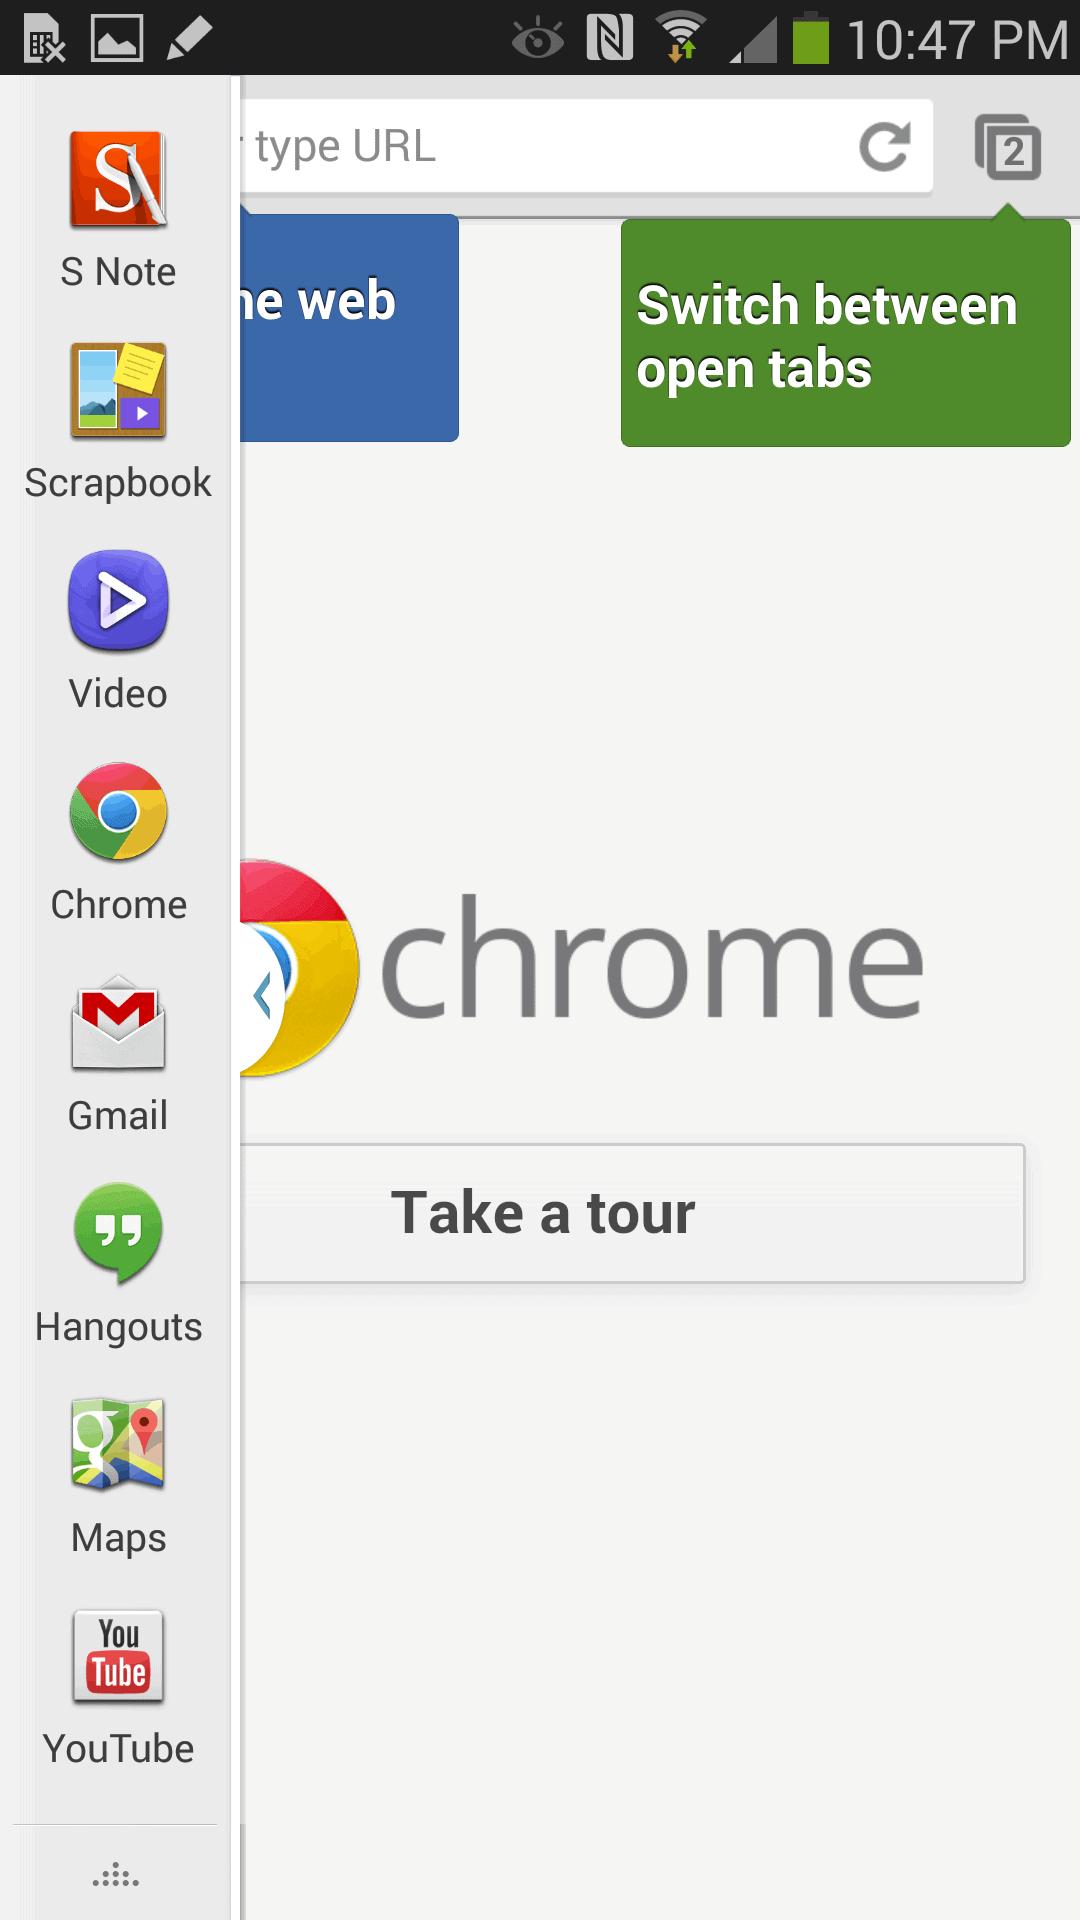 How to use scrapbook in samsung - Screenshot_2013 12 03 22 47 20